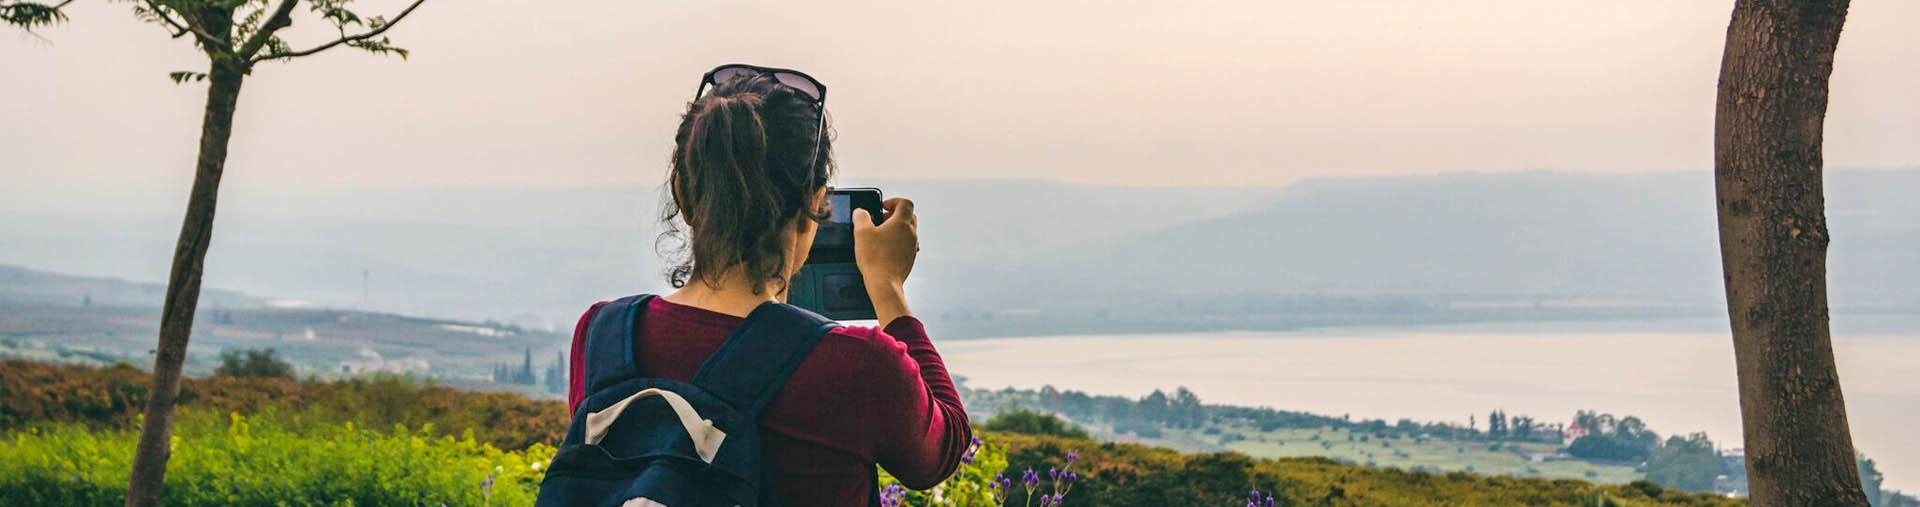 Sea of Galilee view